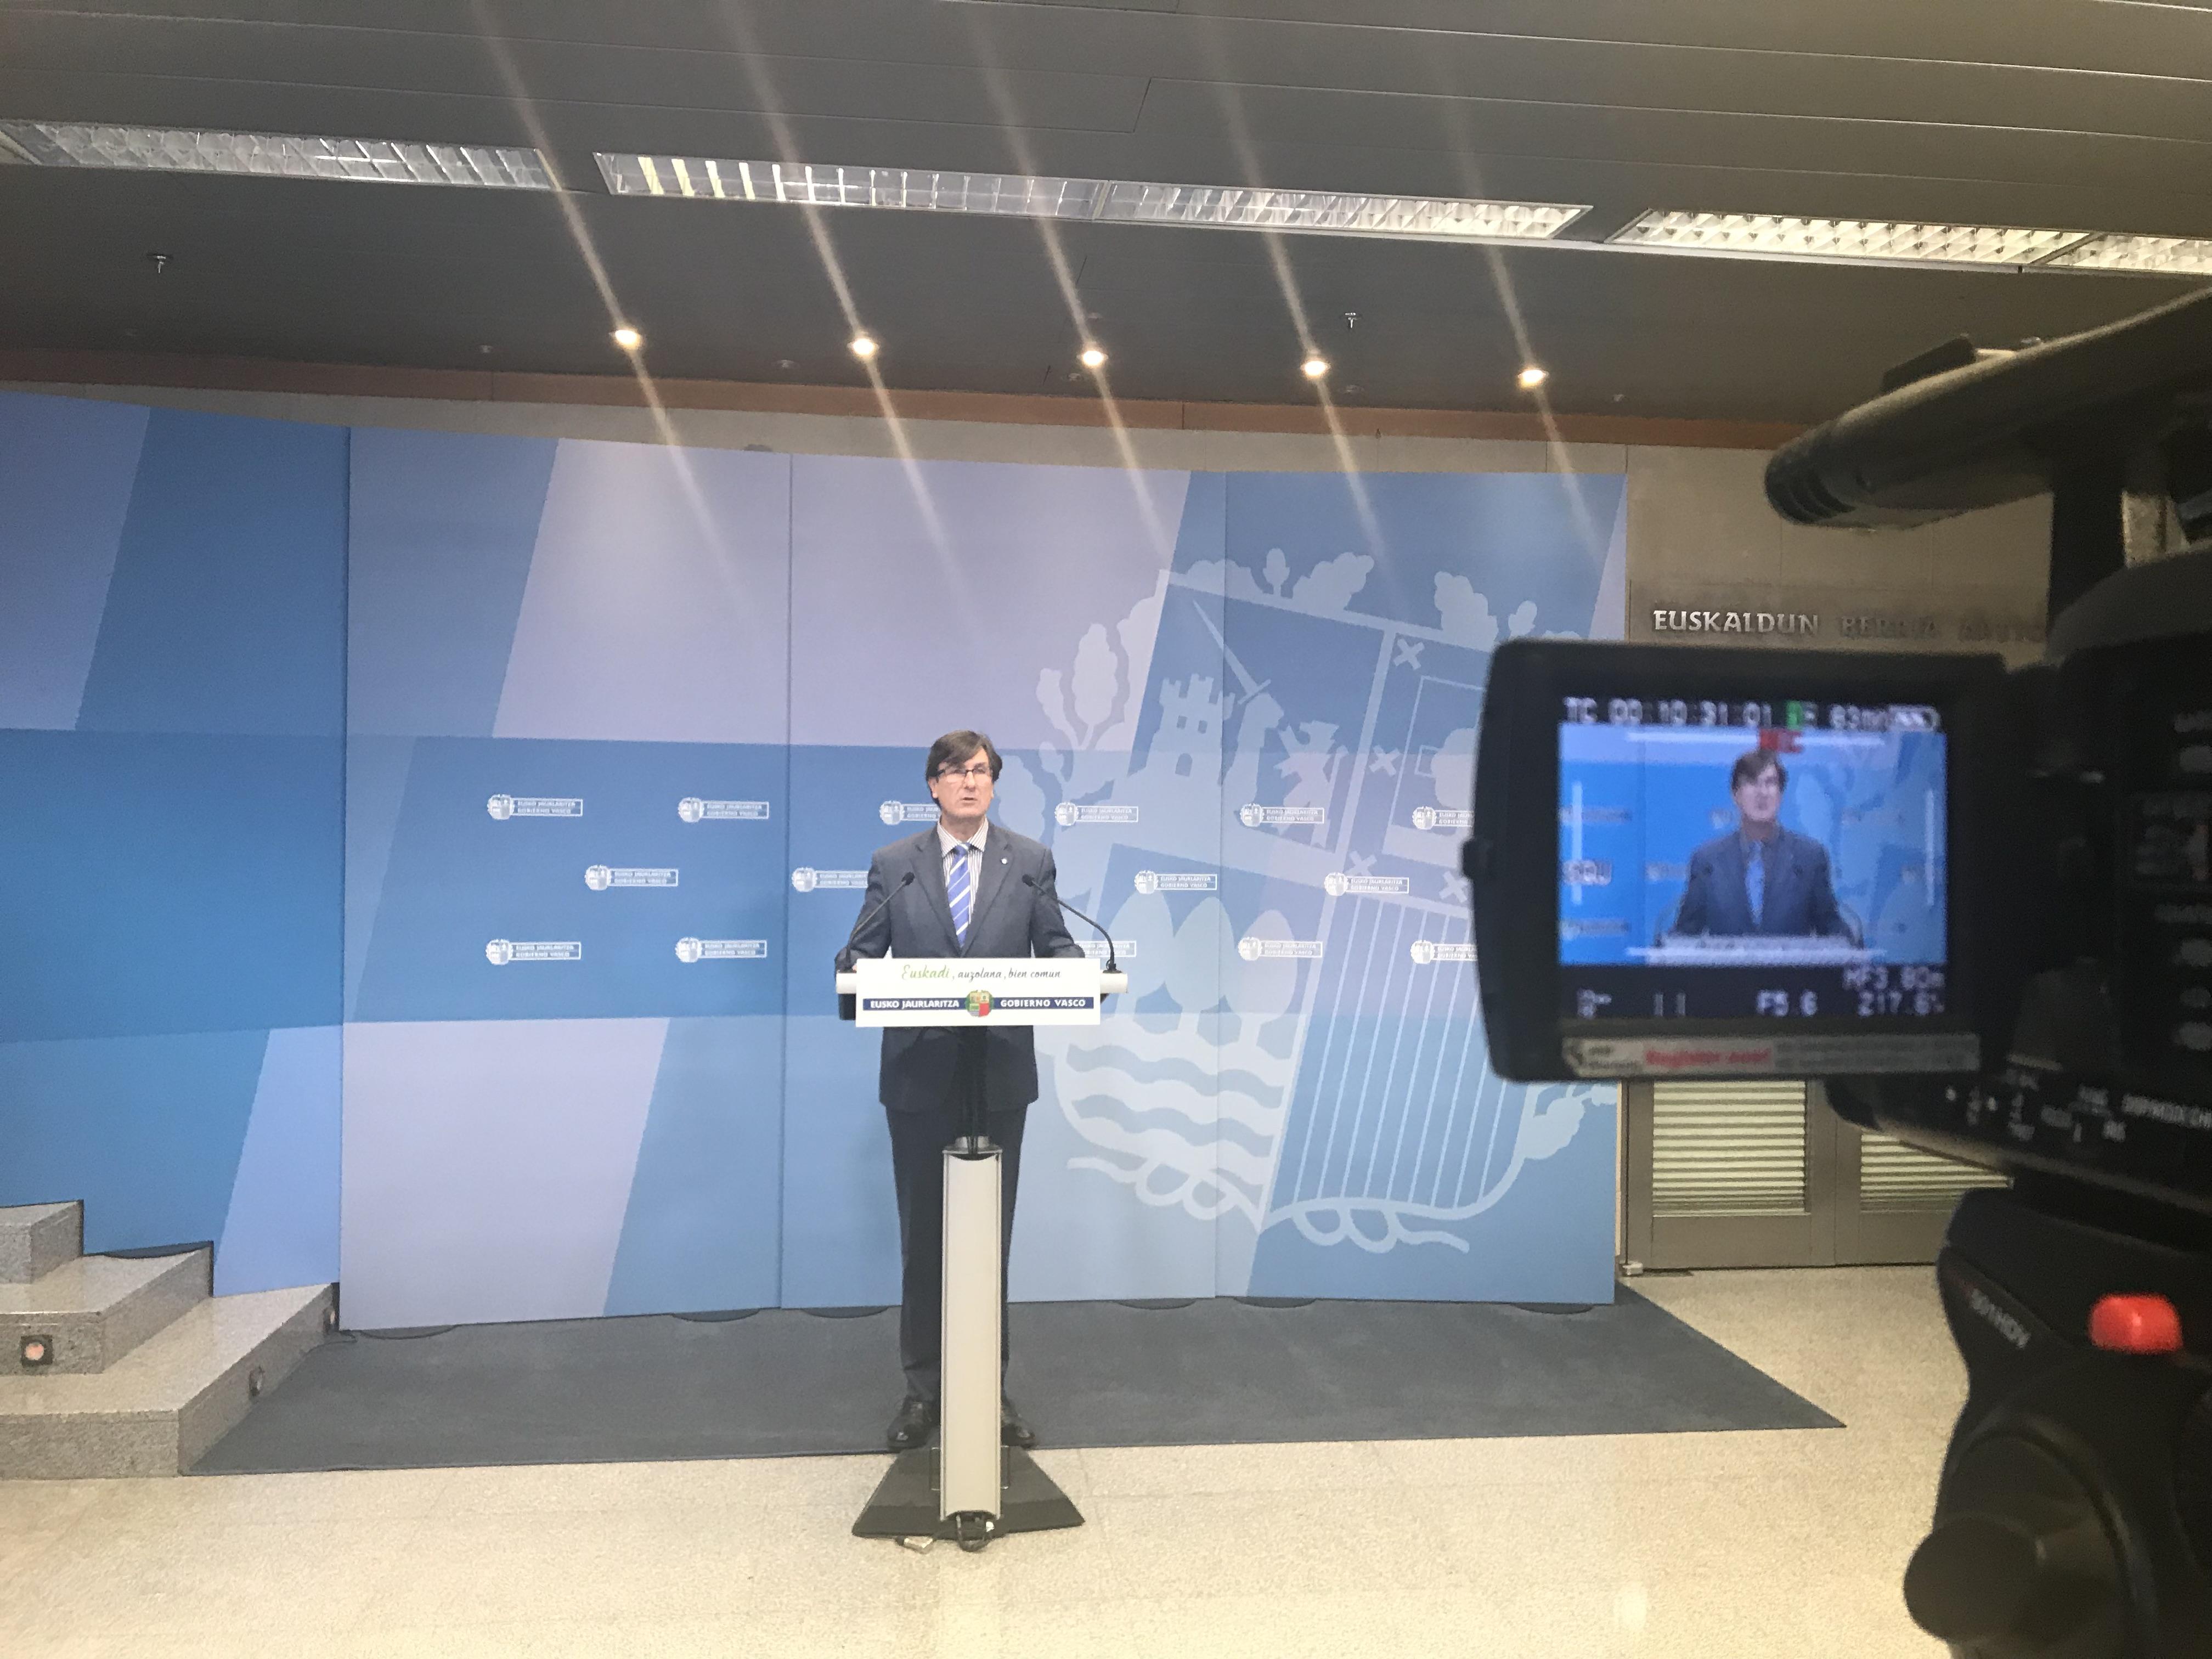 Irekia eusko jaurlaritza gobierno vasco comienza la for Mesa funcion publica